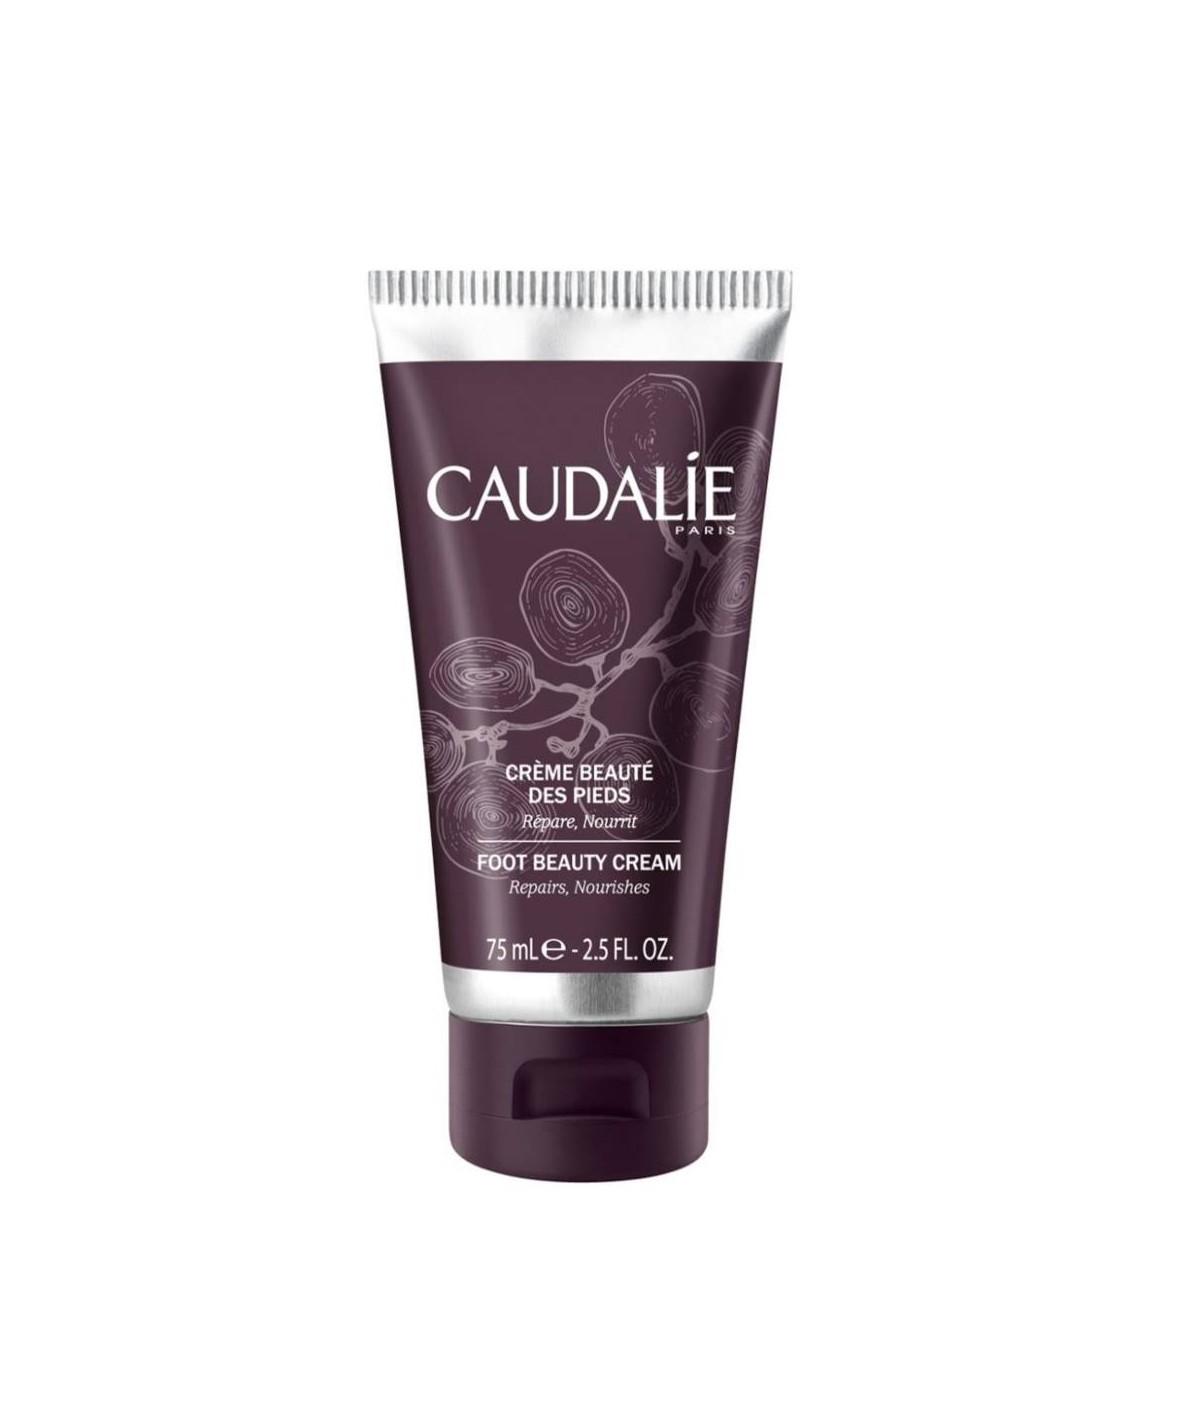 Caudalie – Crema belleza de Pies 75ml